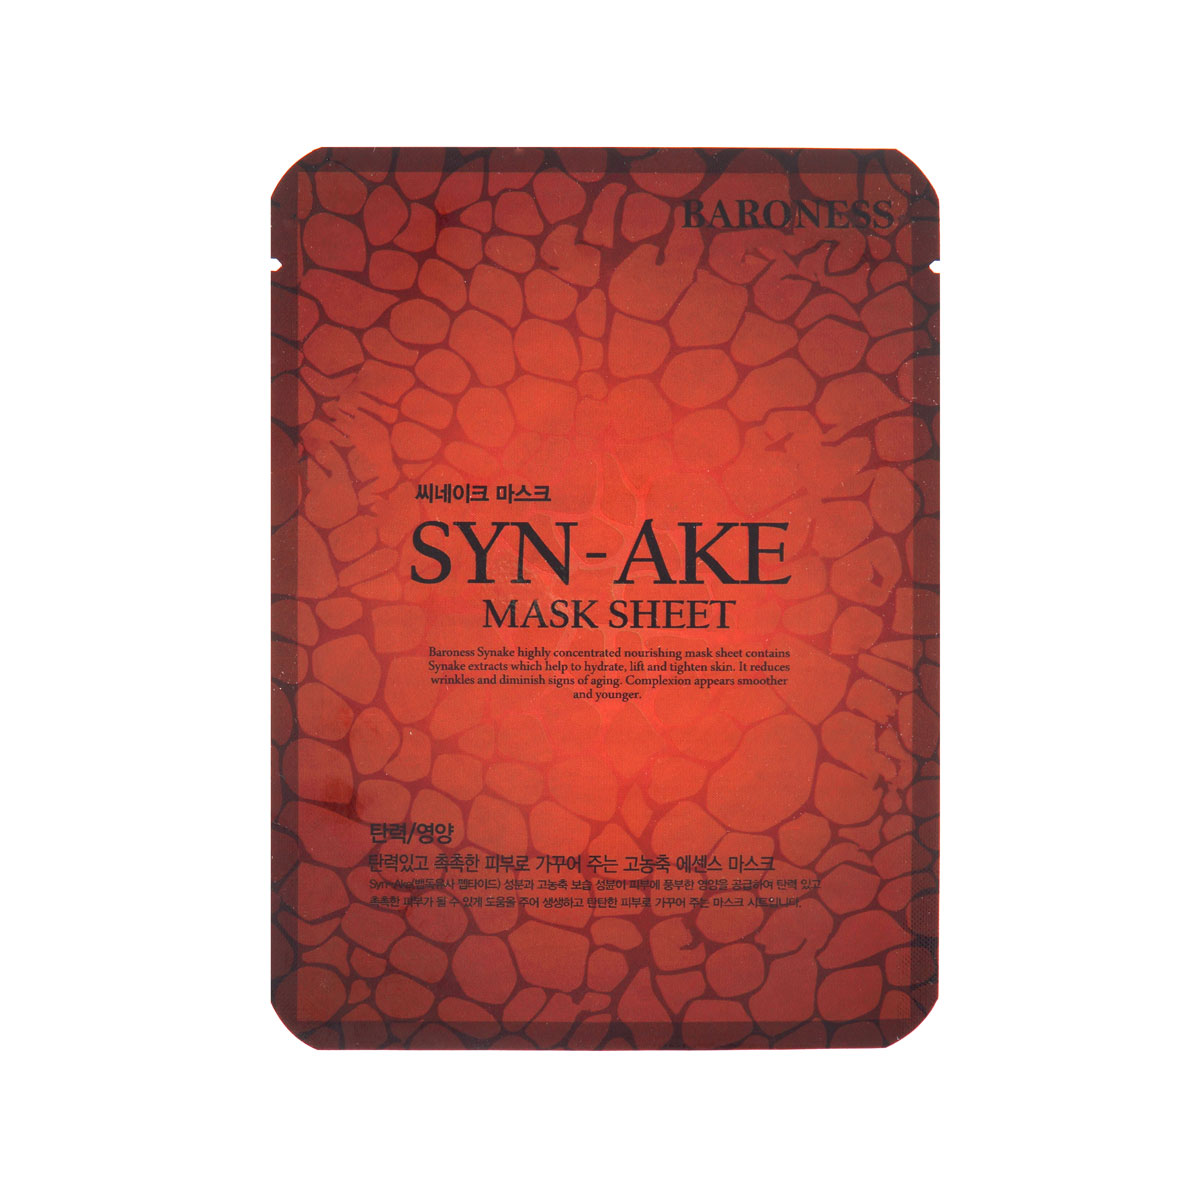 BARONESS MASK SHEET SYN-AKE